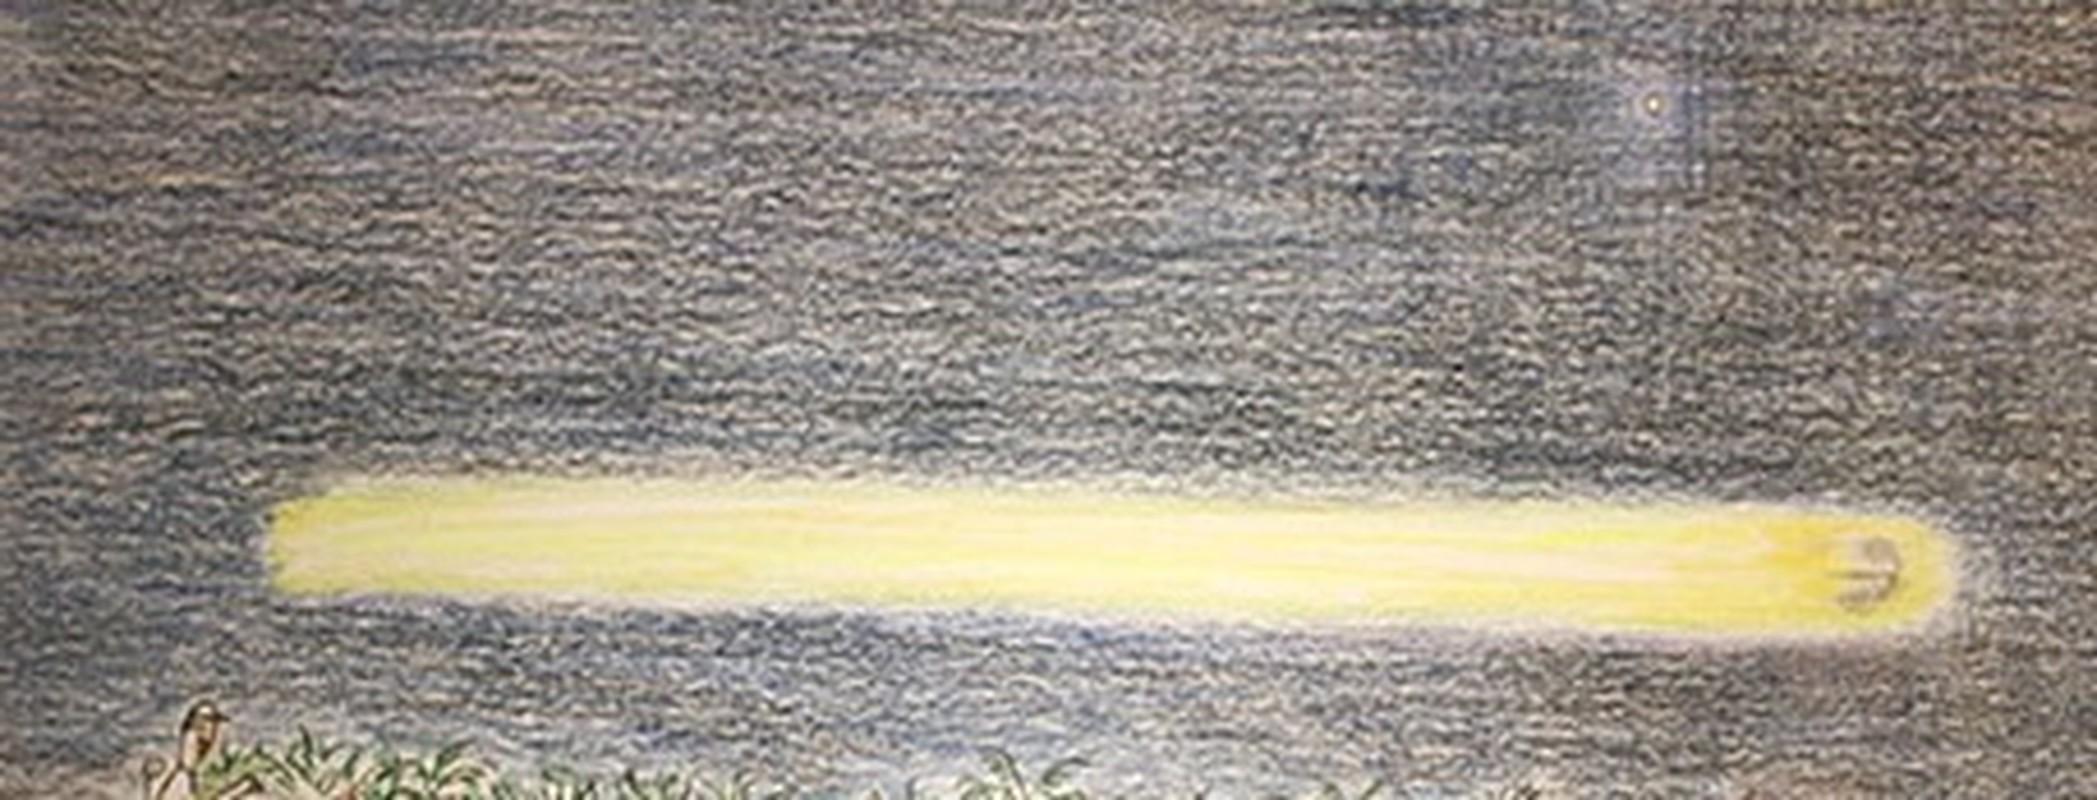 Sung sot vat the giong UFO bang ngang truoc khi phong ten lua-Hinh-3